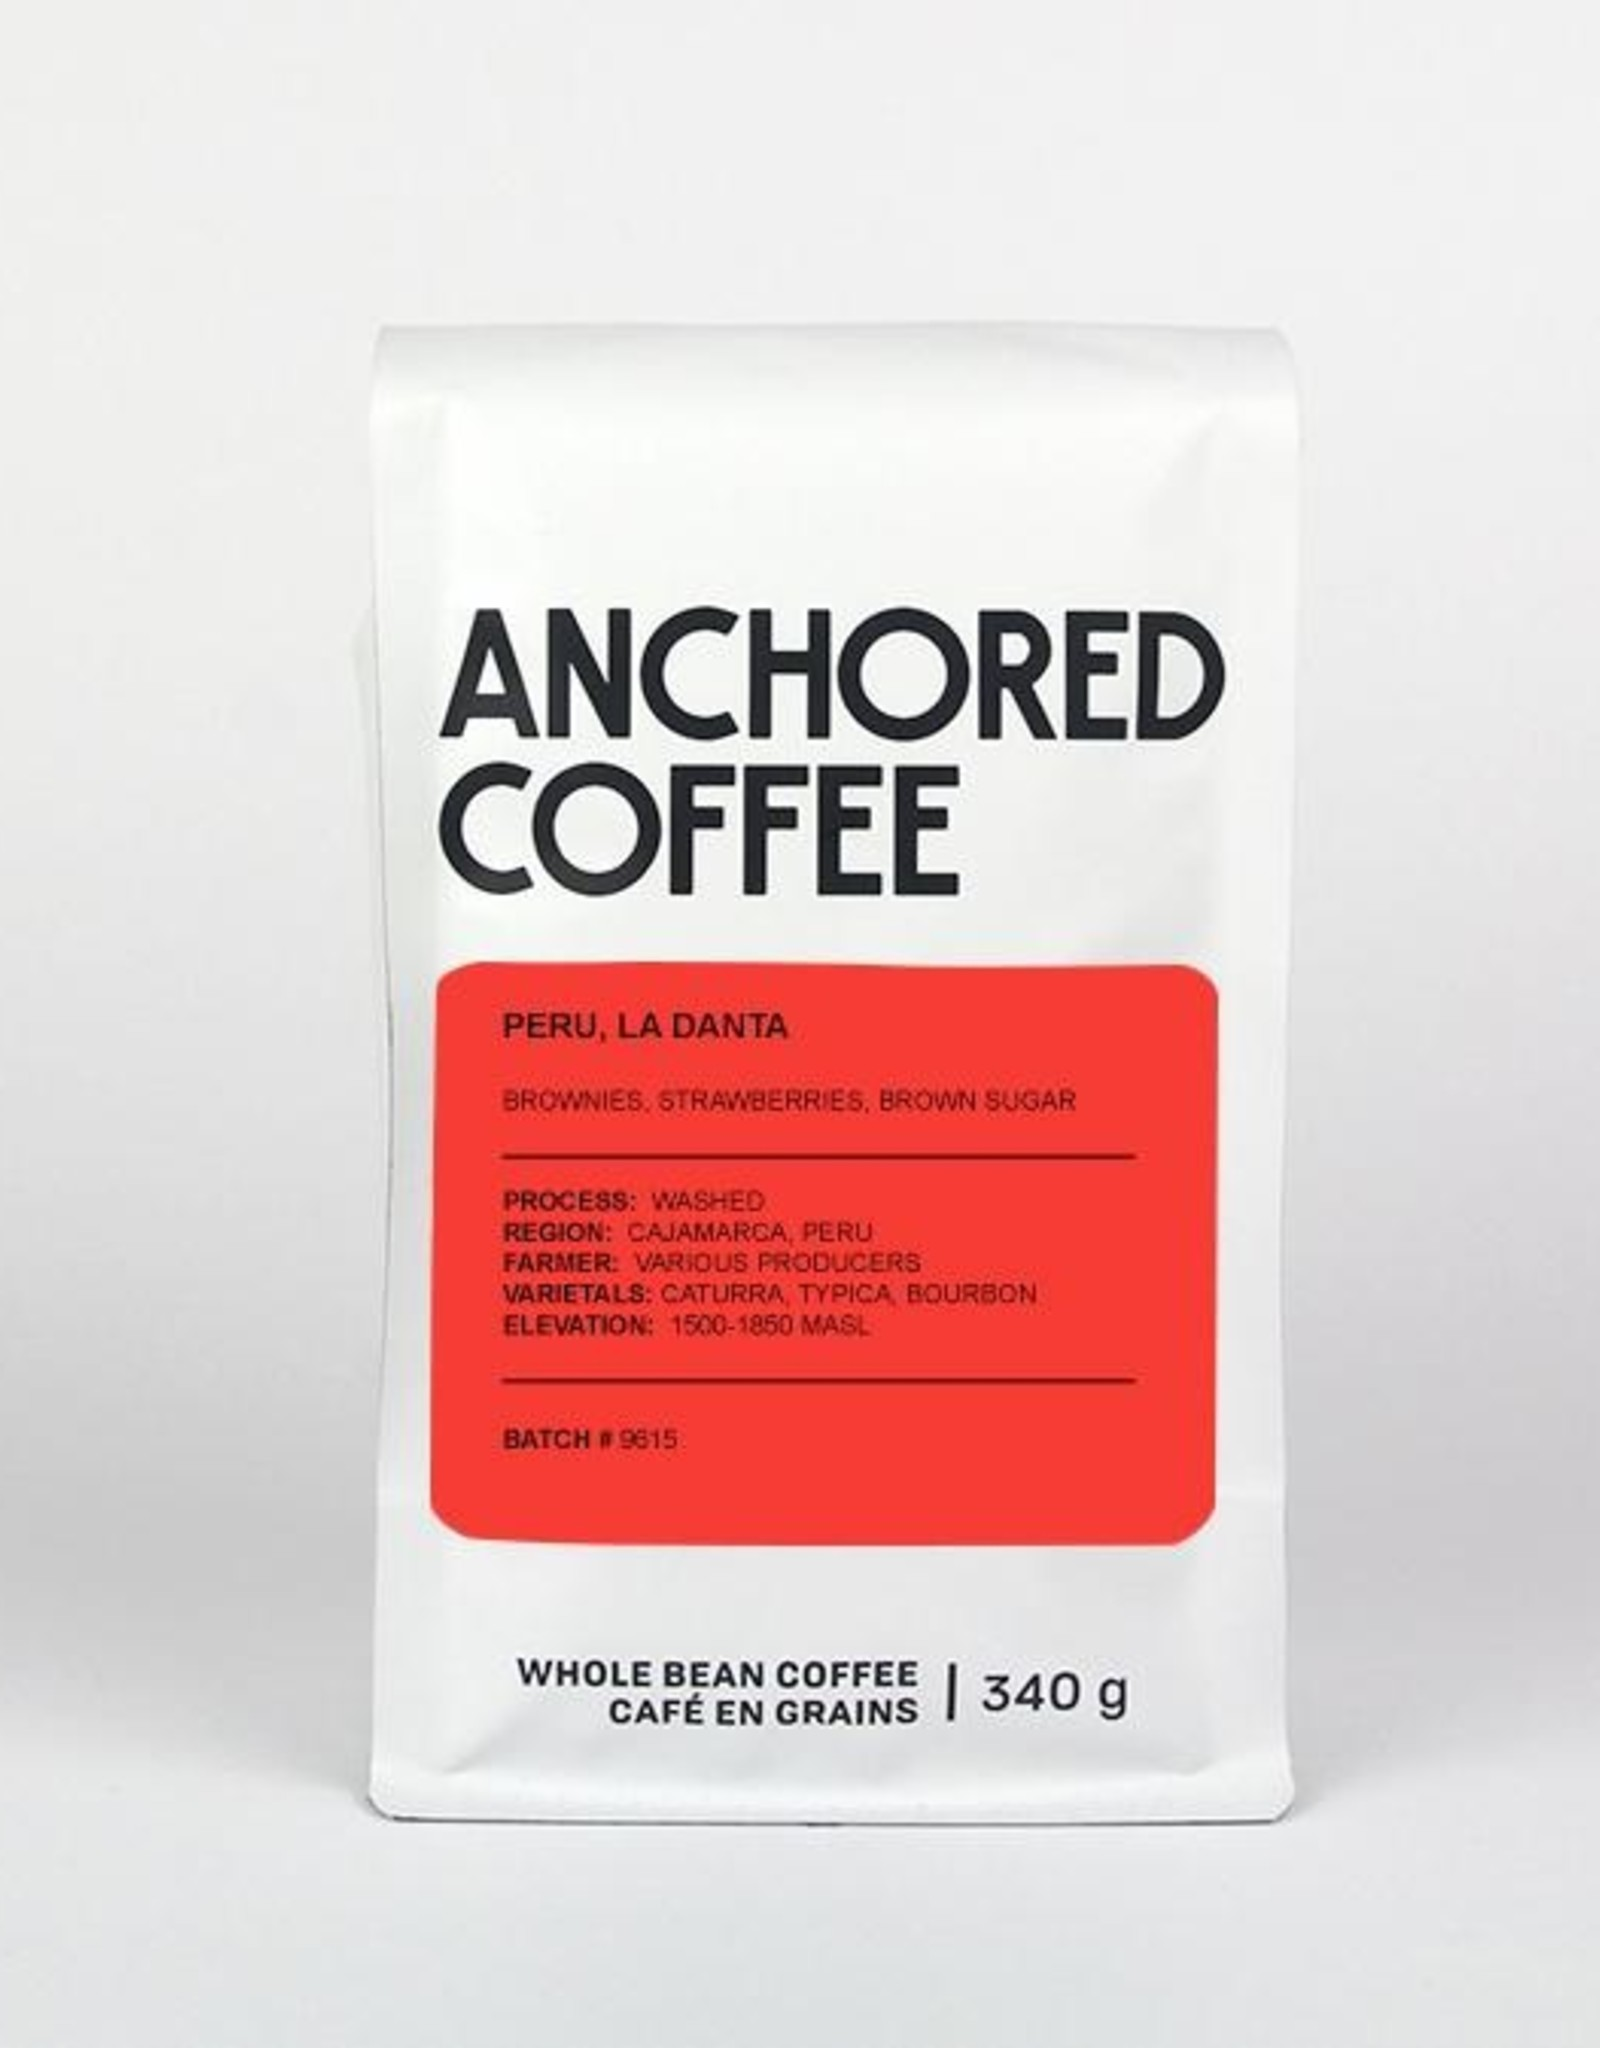 Café Anchored - Peru, La Danta - Espresso - 340g